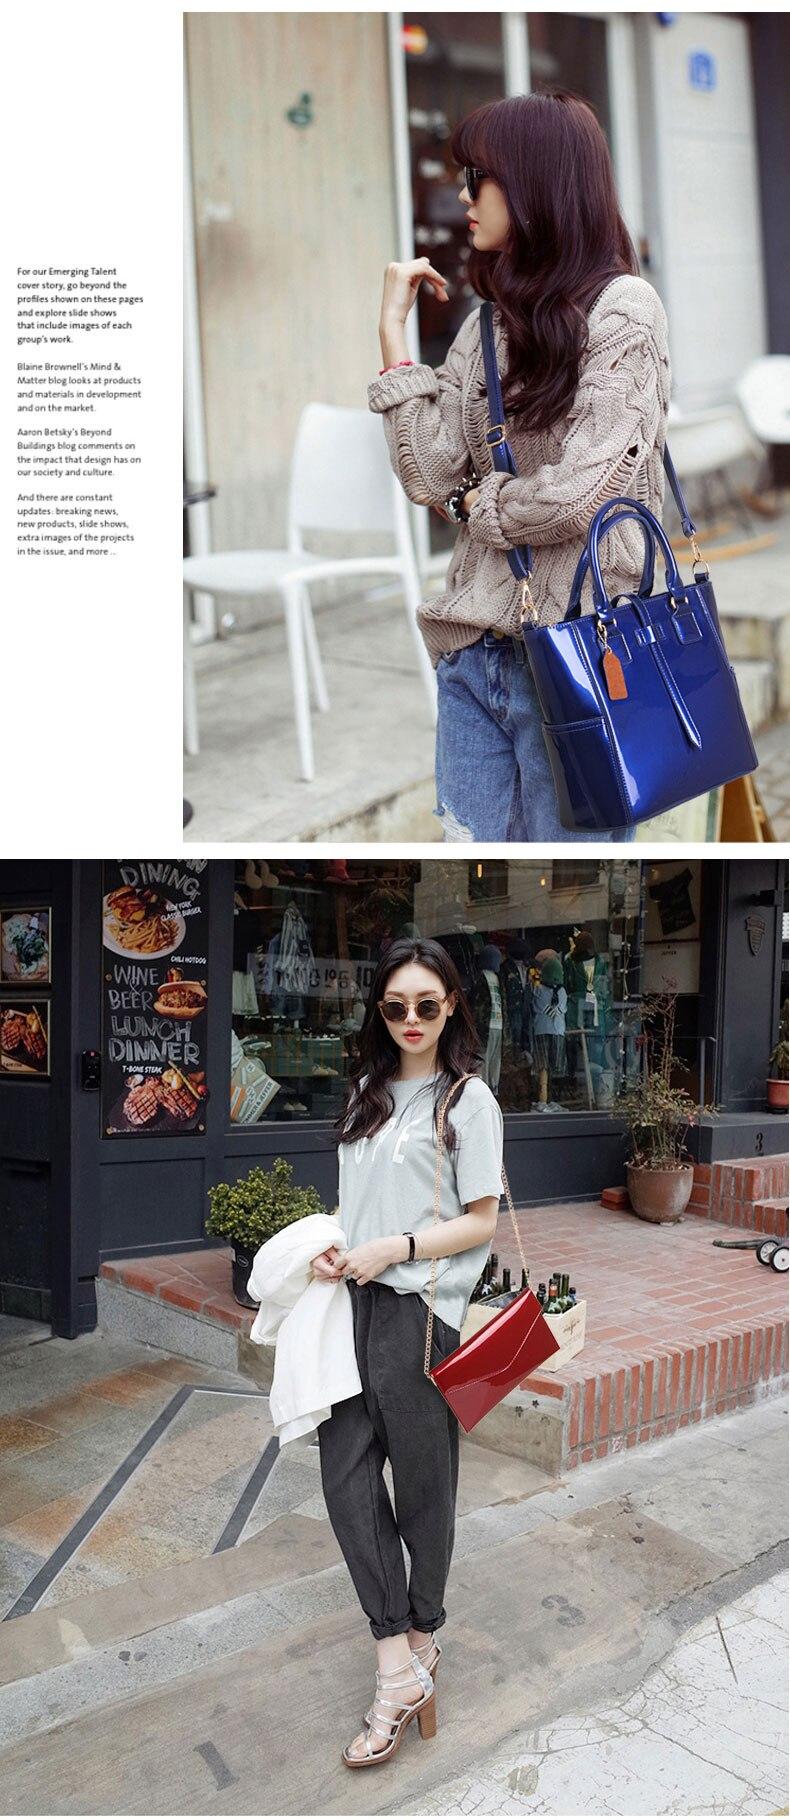 e bolsas moda marcas famosas designer bolsa